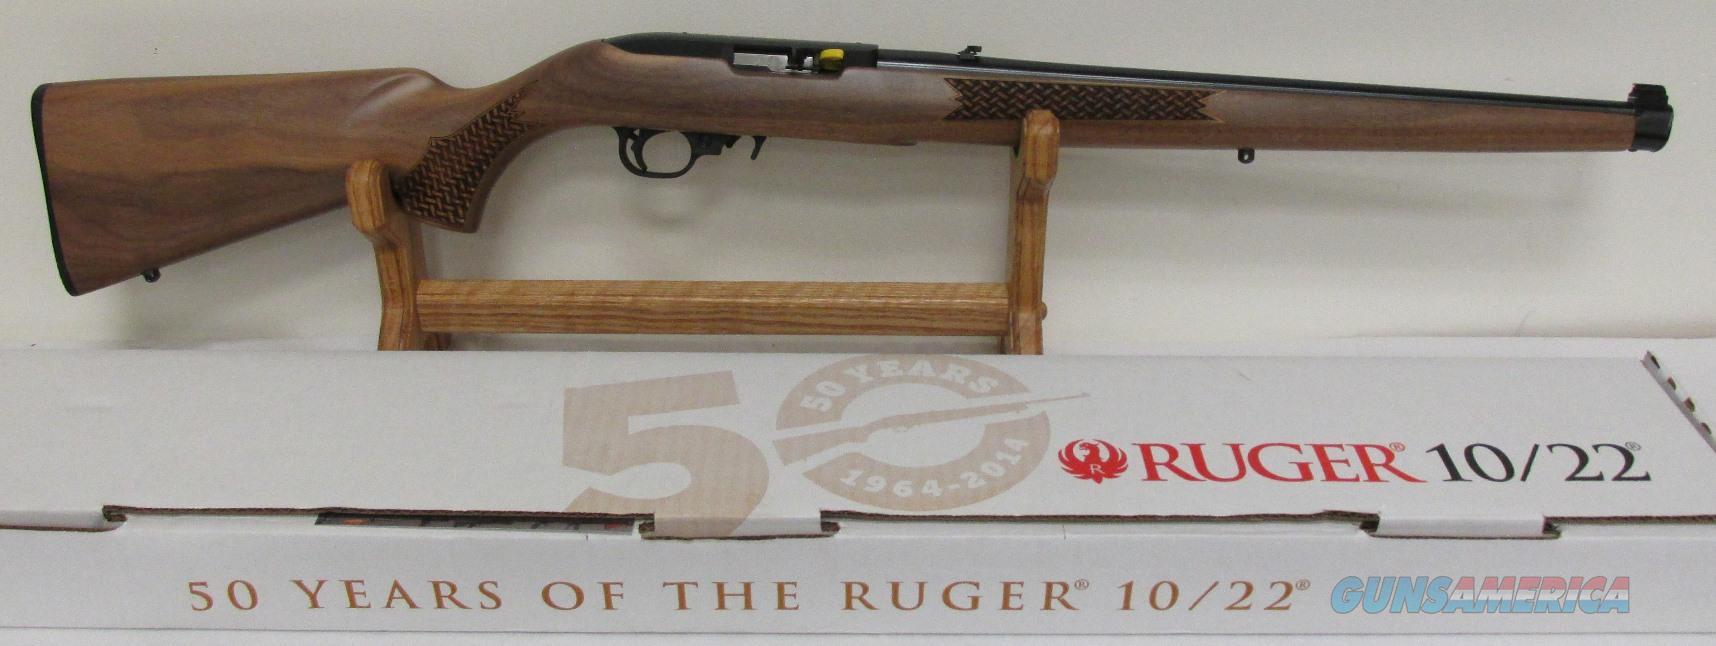 Ruger 50th anniversary mannlicher talo 10 22 11104 guns gt rifles